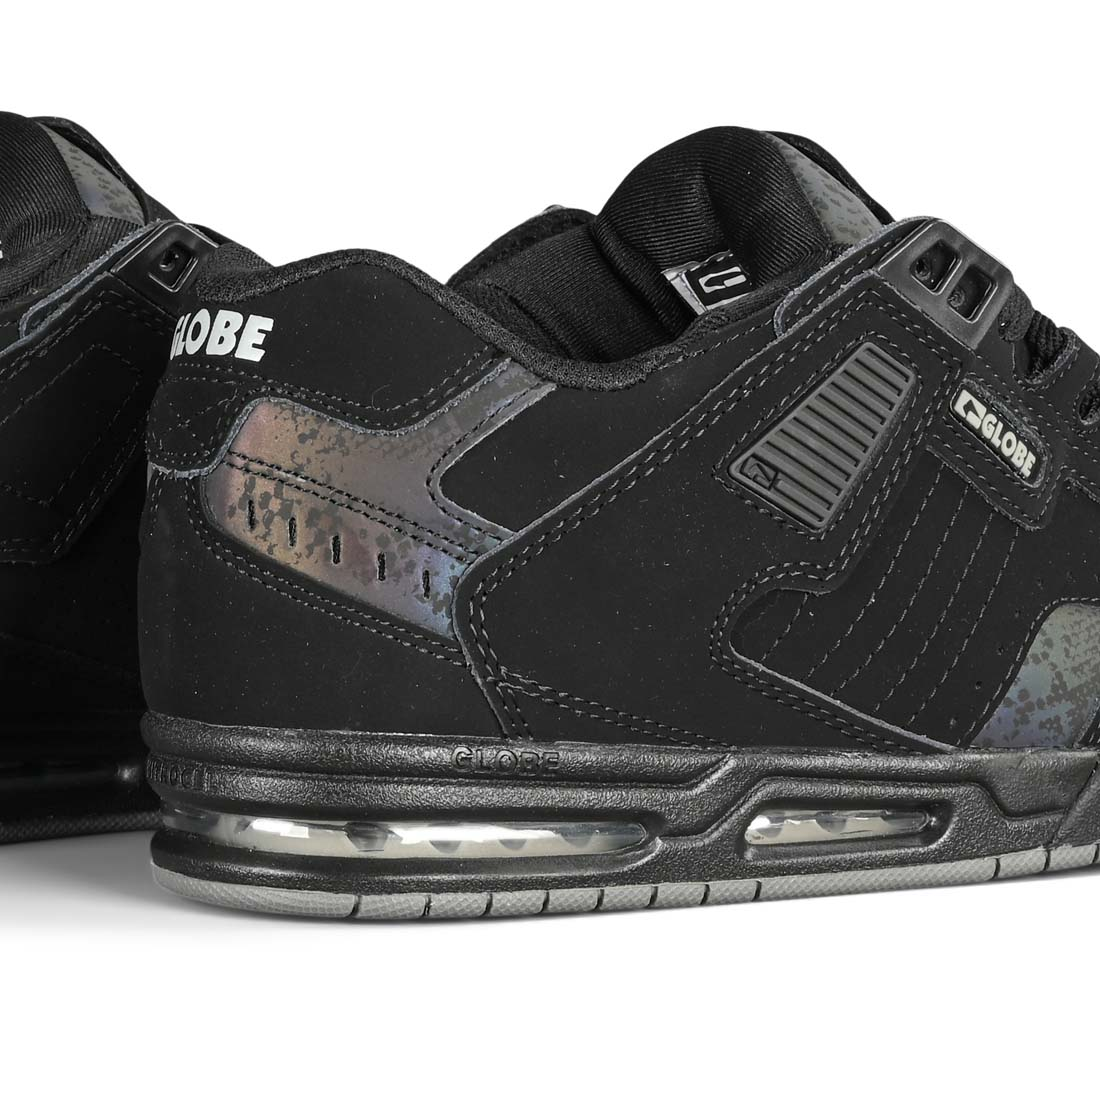 Globe Sabre Skate Shoes - Black / 3M